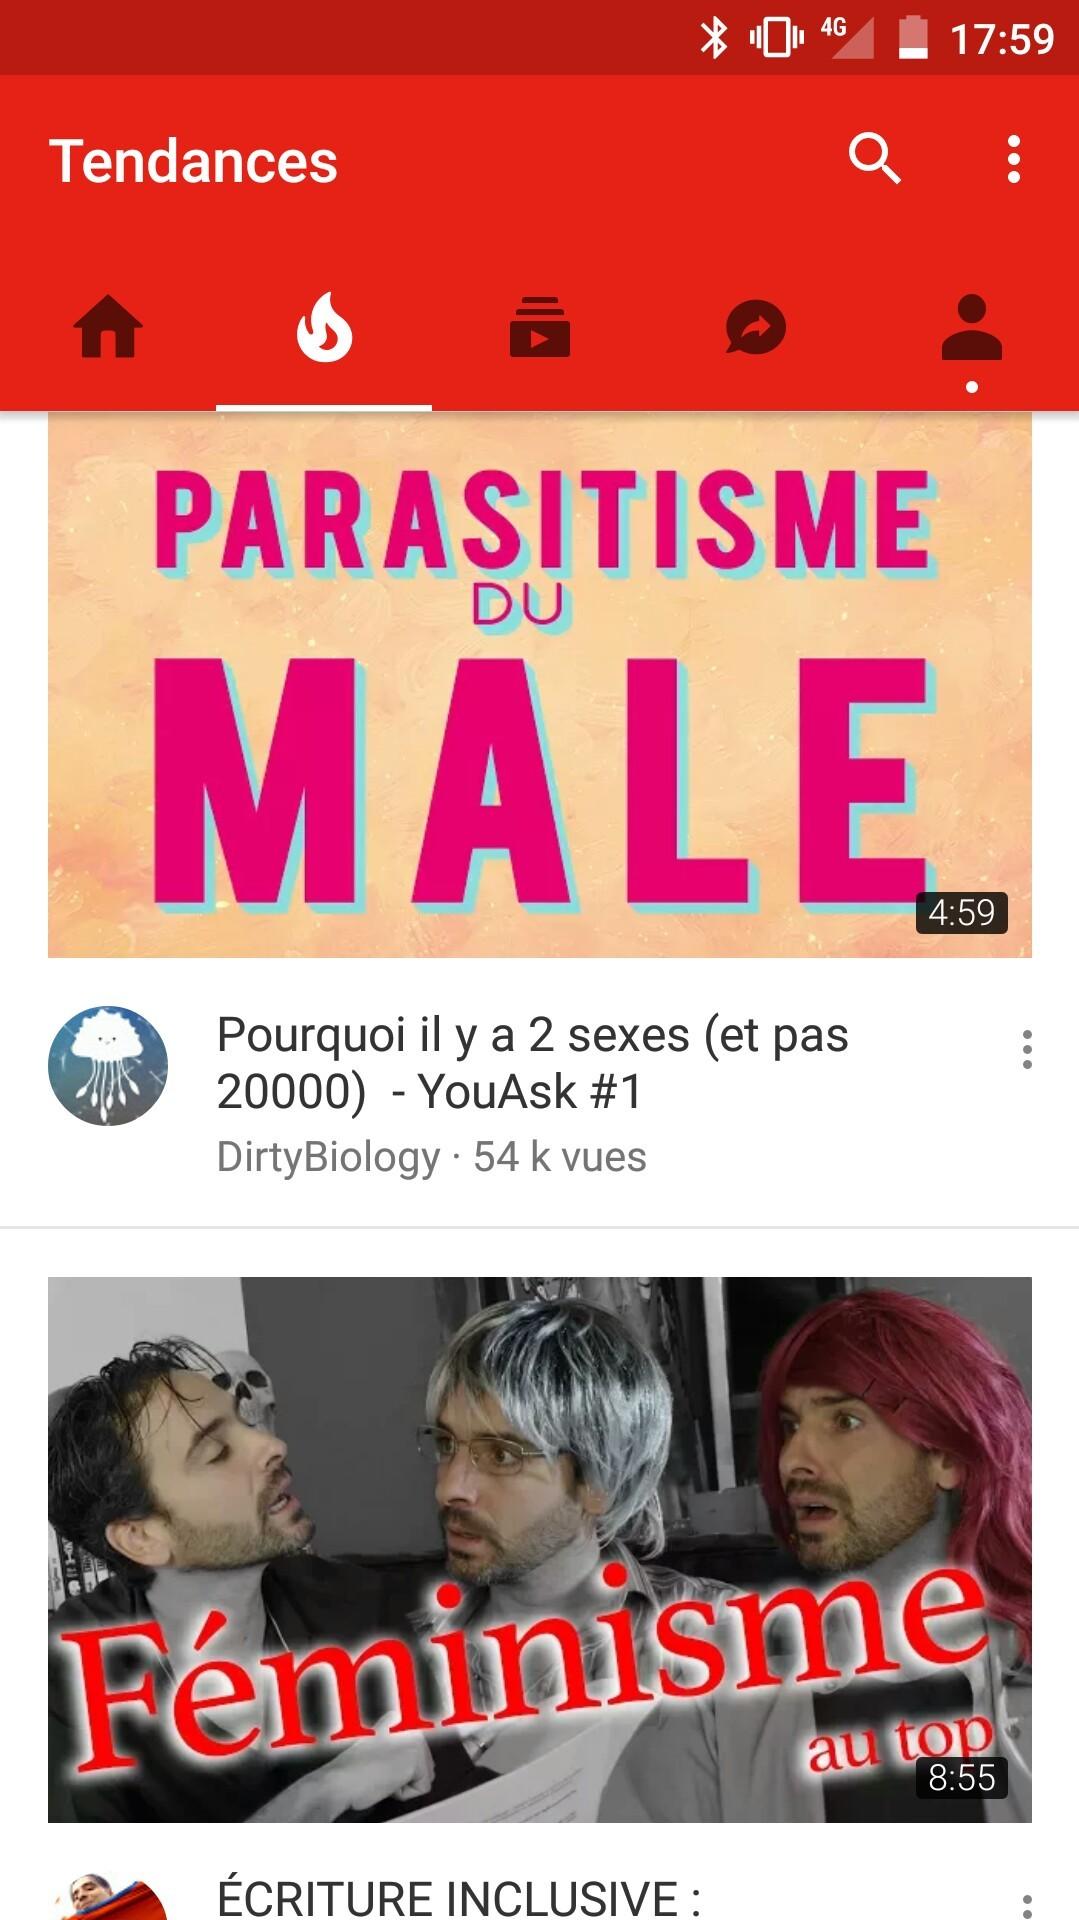 J'Adore les Tendances YouTube ^^ - meme